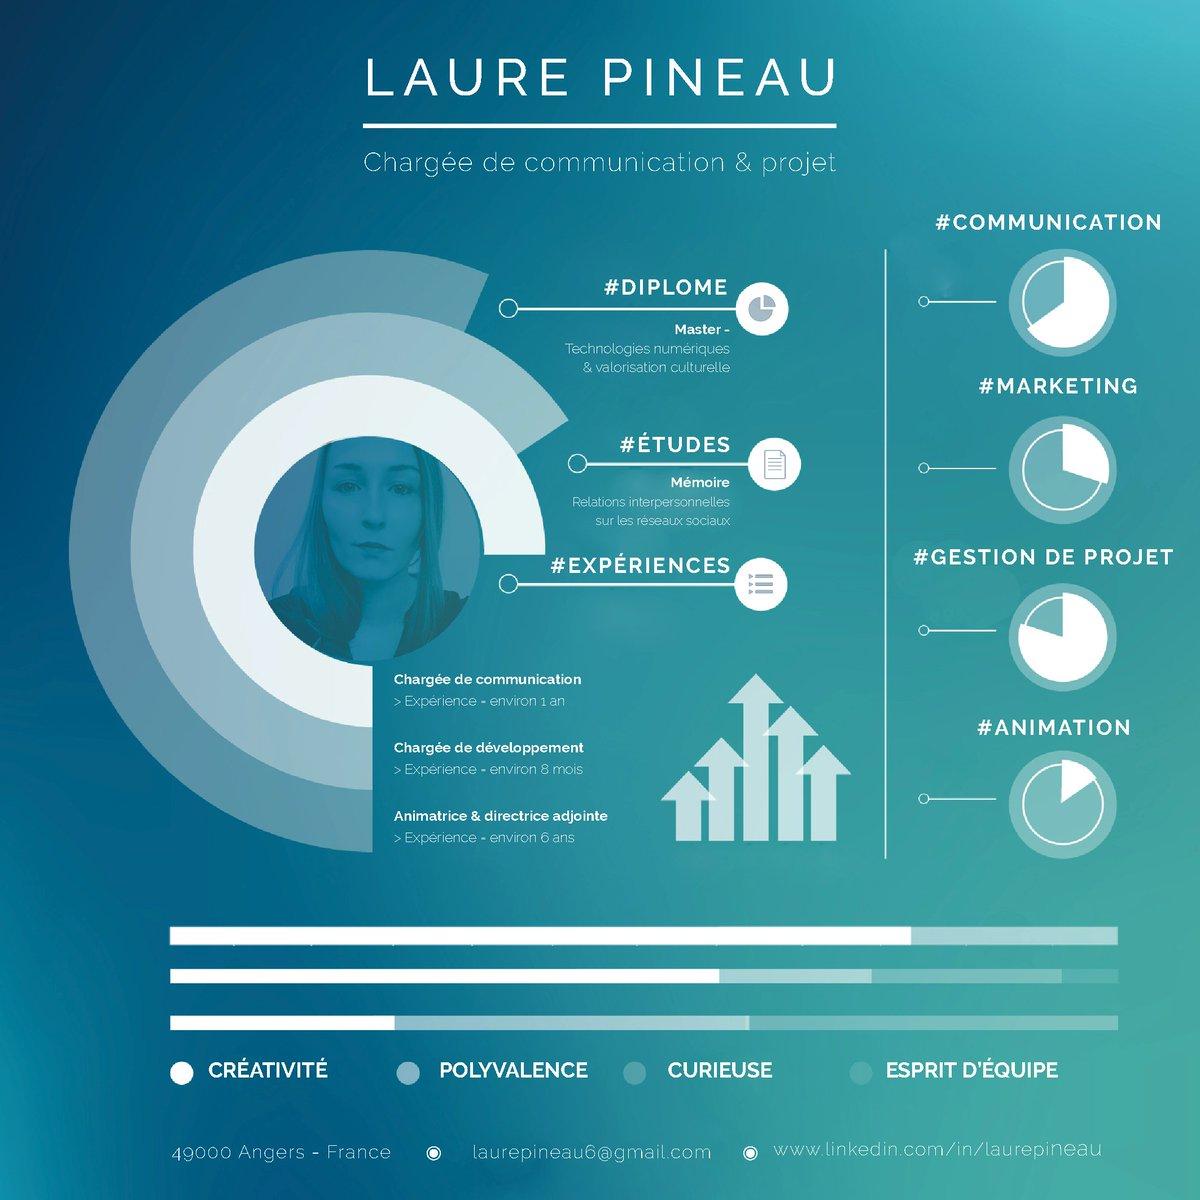 Hello Twitter !! #PleaseRT &gt; Recherche #emploi chargée de #communication et/ou #projet en #paysdelaloire #Angers #i4Emploi &gt; Merci d&#39;avance<br>http://pic.twitter.com/HXQSwUxUog